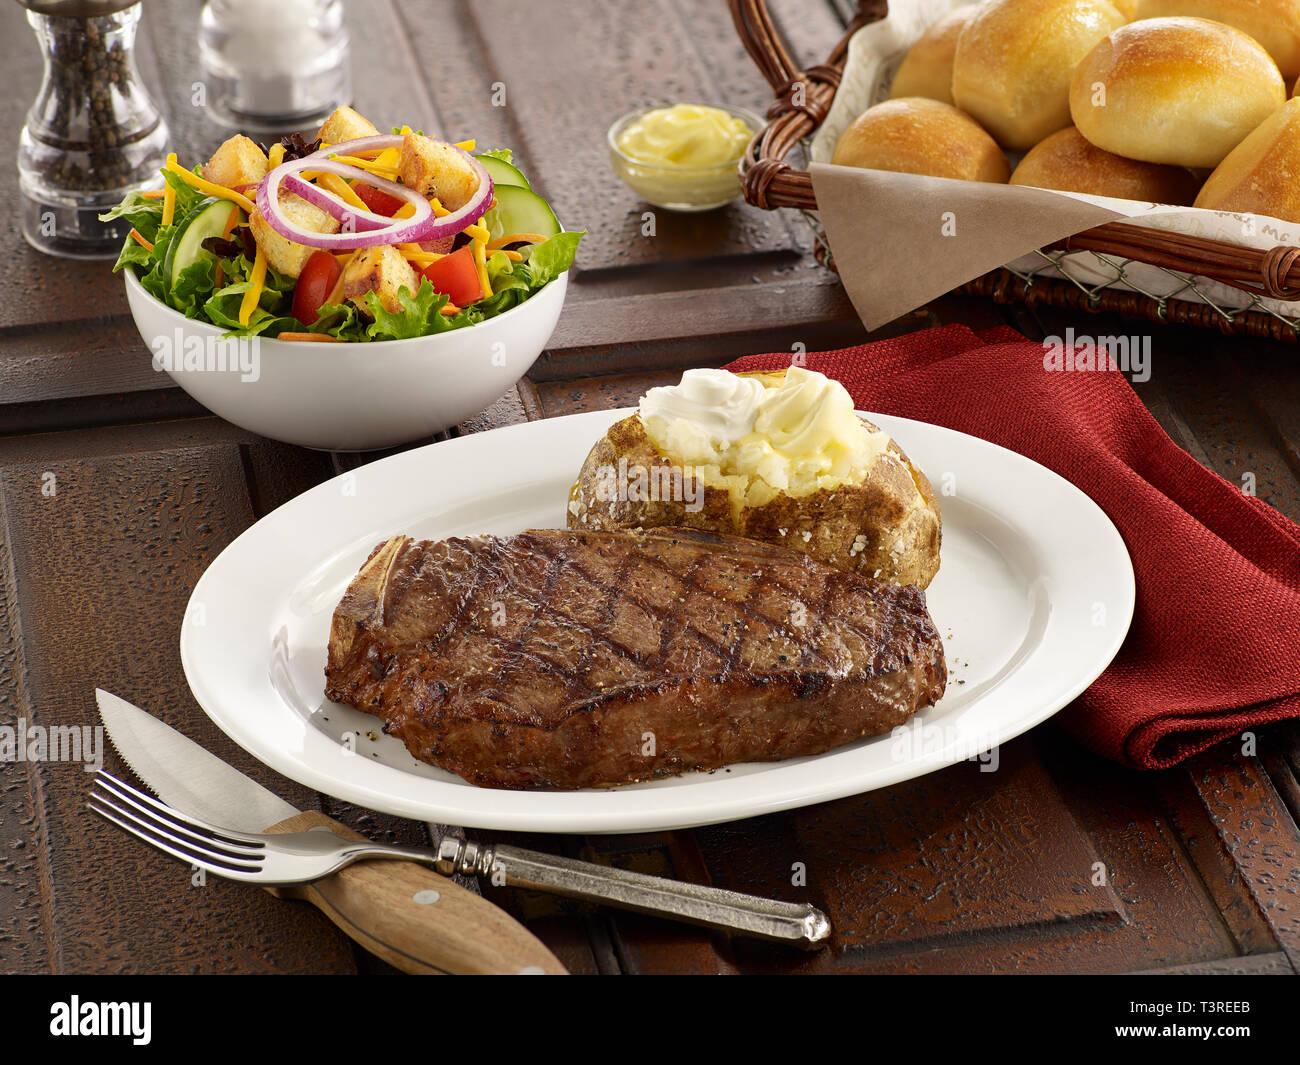 Kansas City Steak with baked potato and salad - Stock Image